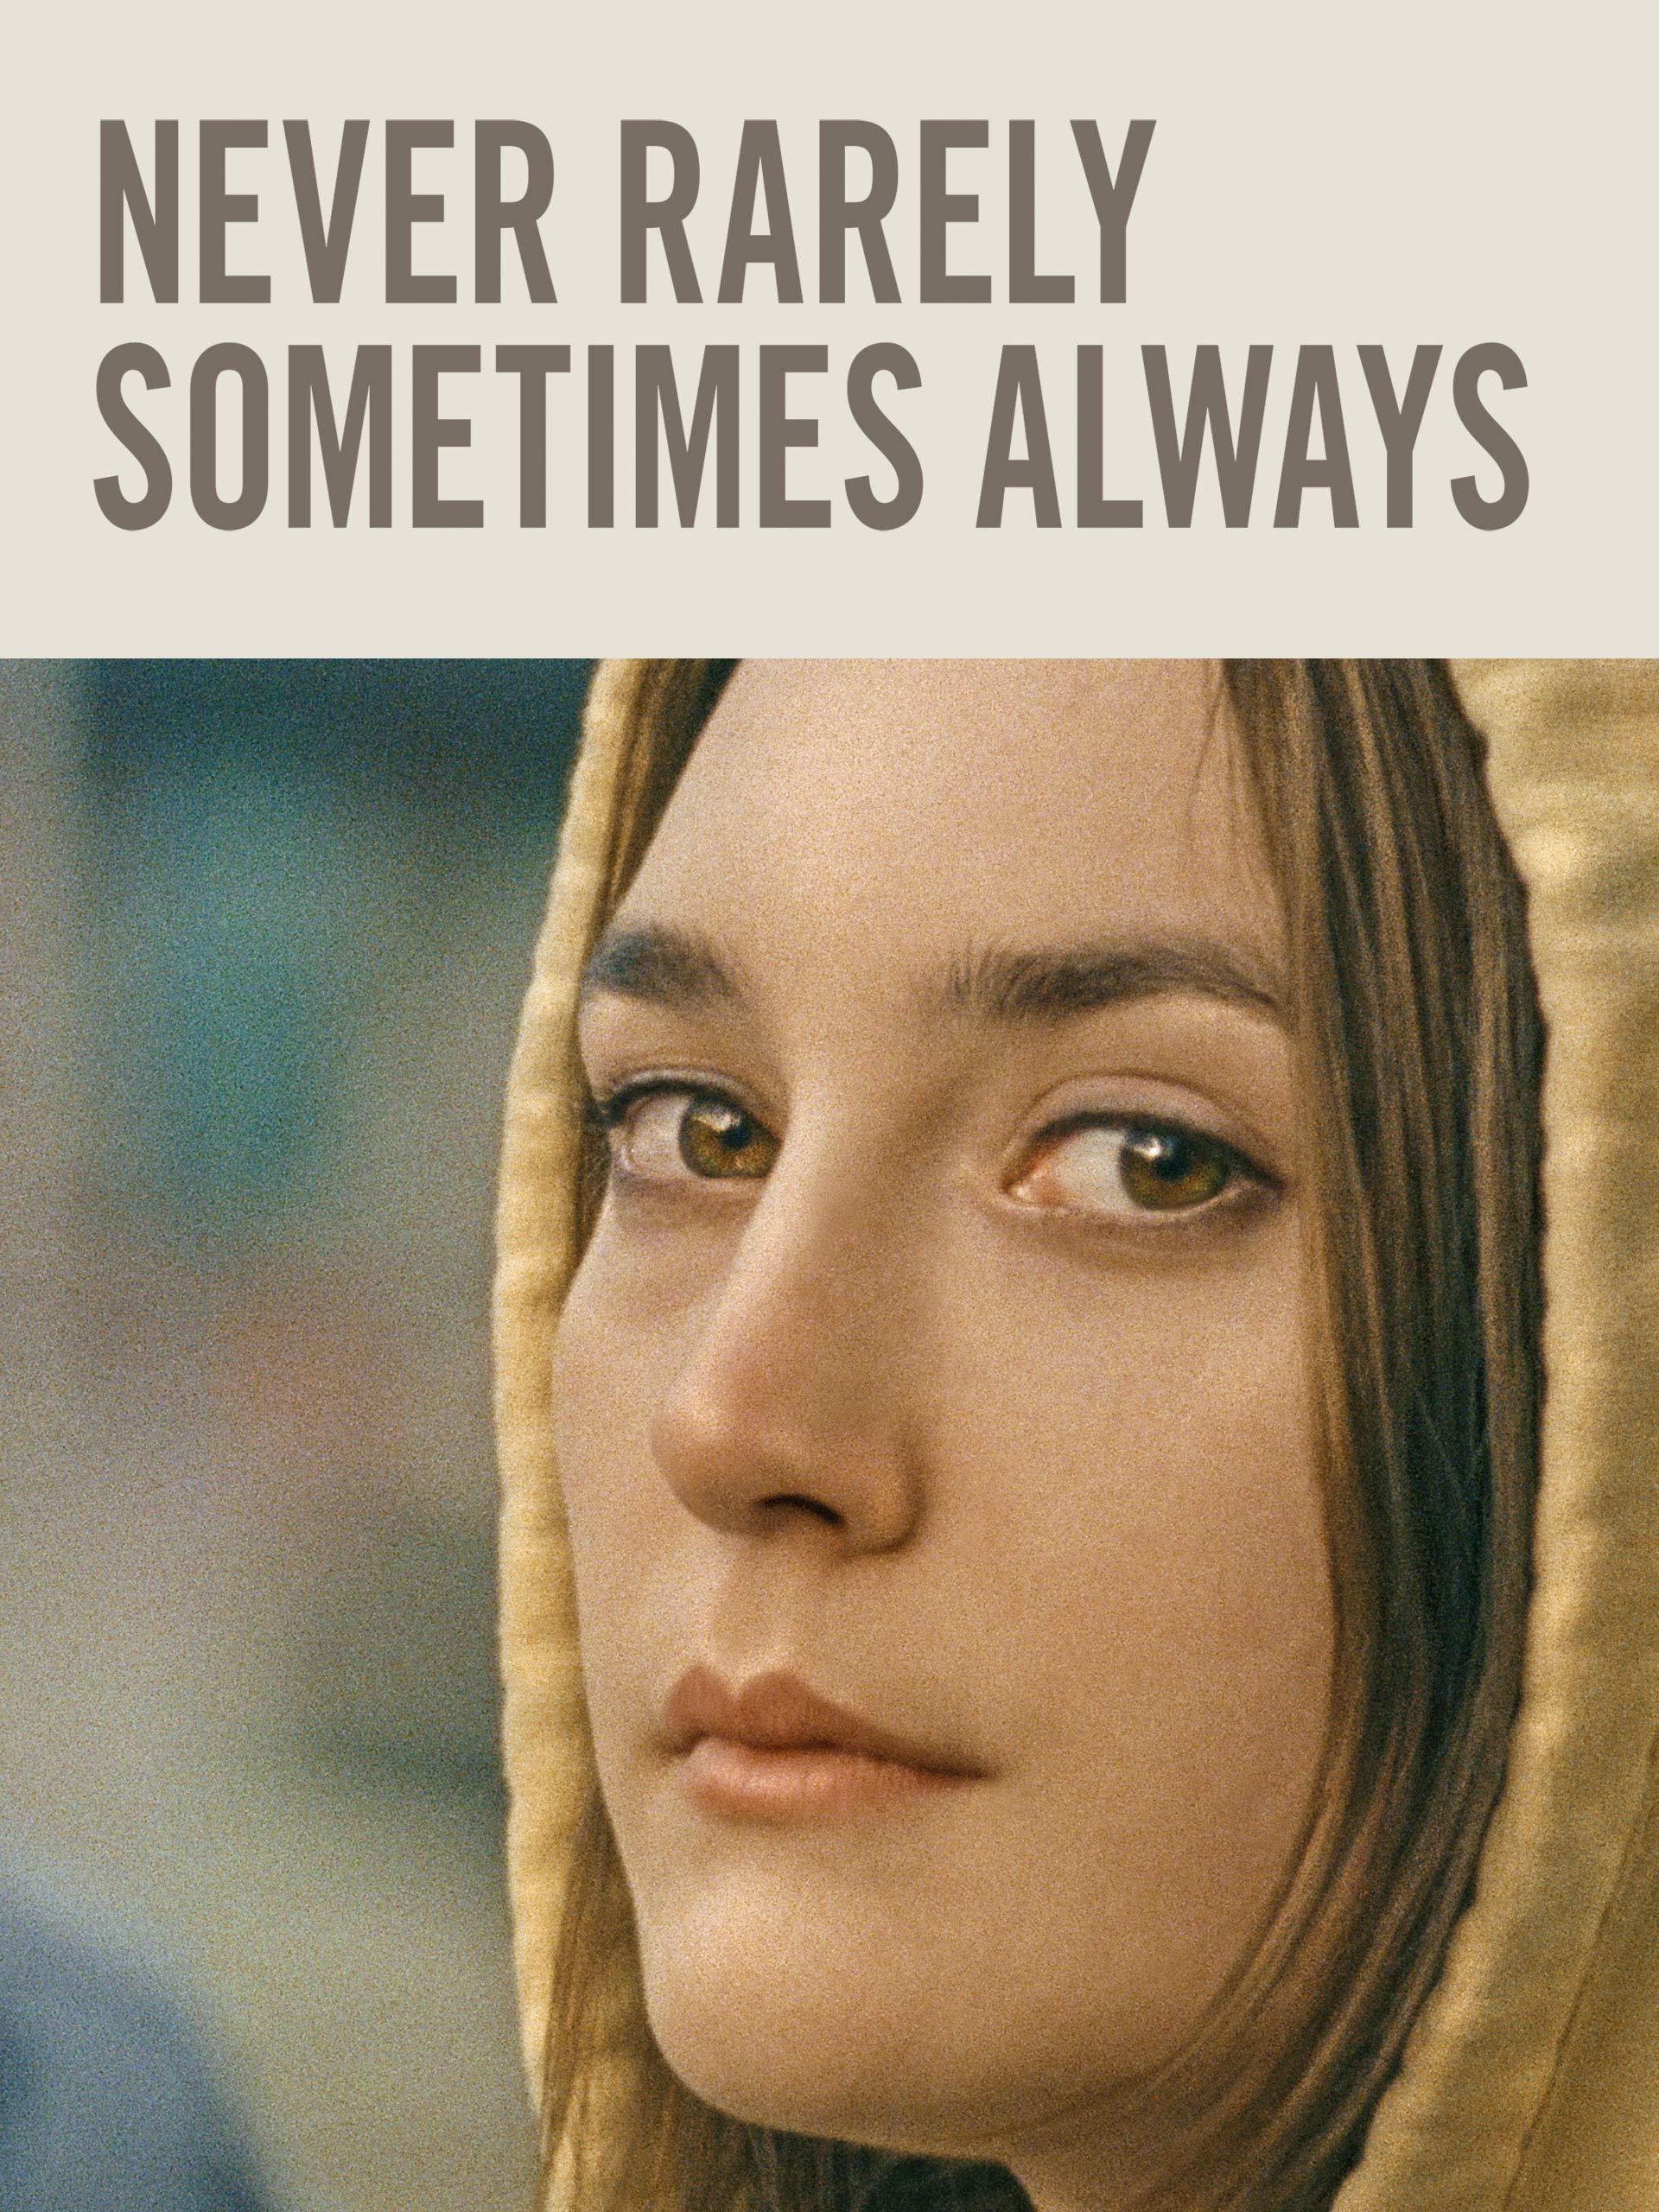 Amazon.com: Never Rarely Sometimes Always: Sidney Flanigan, Talia Ryder, Theodore Pellerin, Ryan Eggold